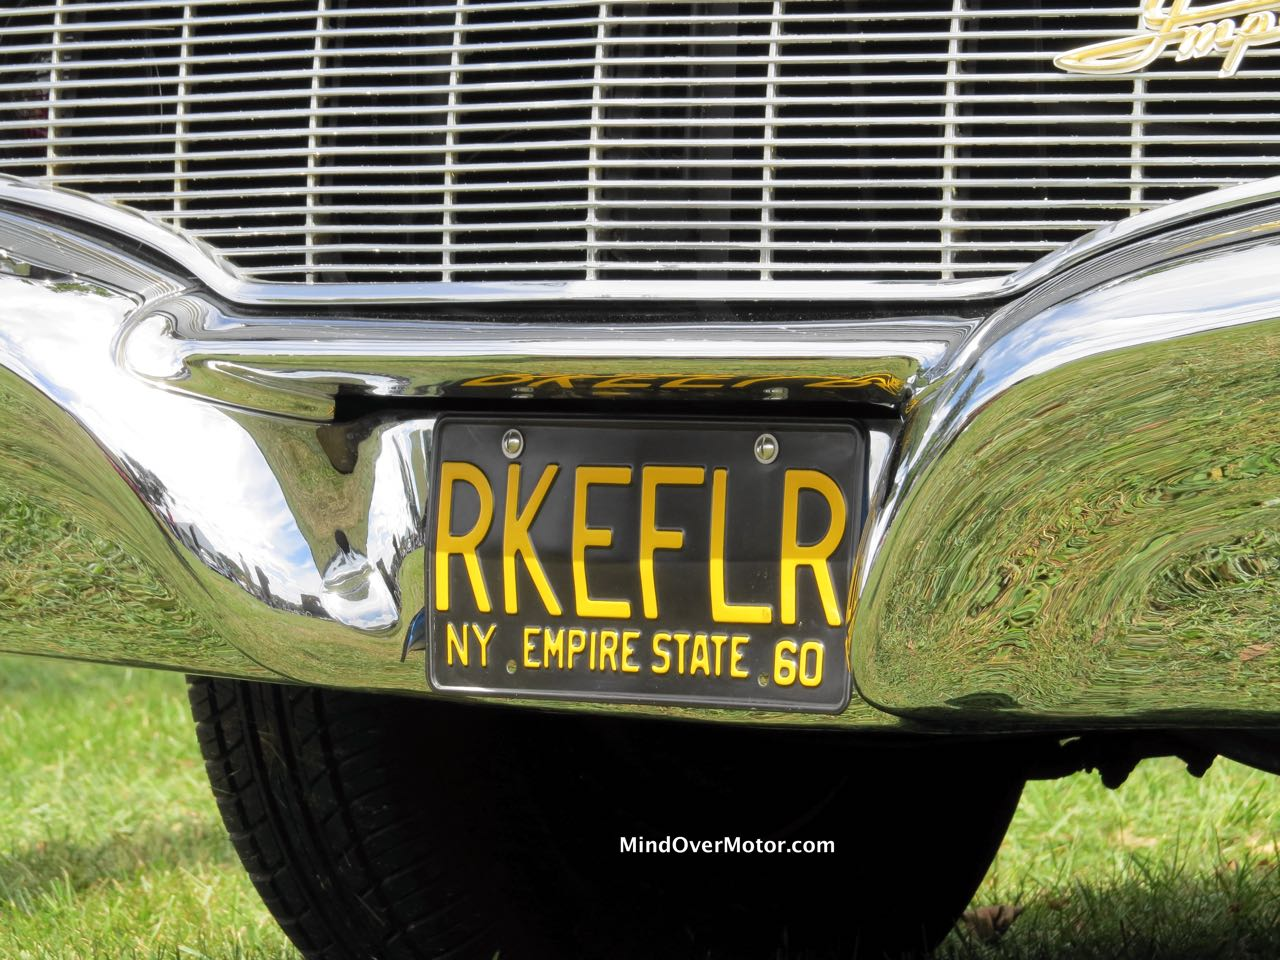 Rockefeller Limo Front License Plate